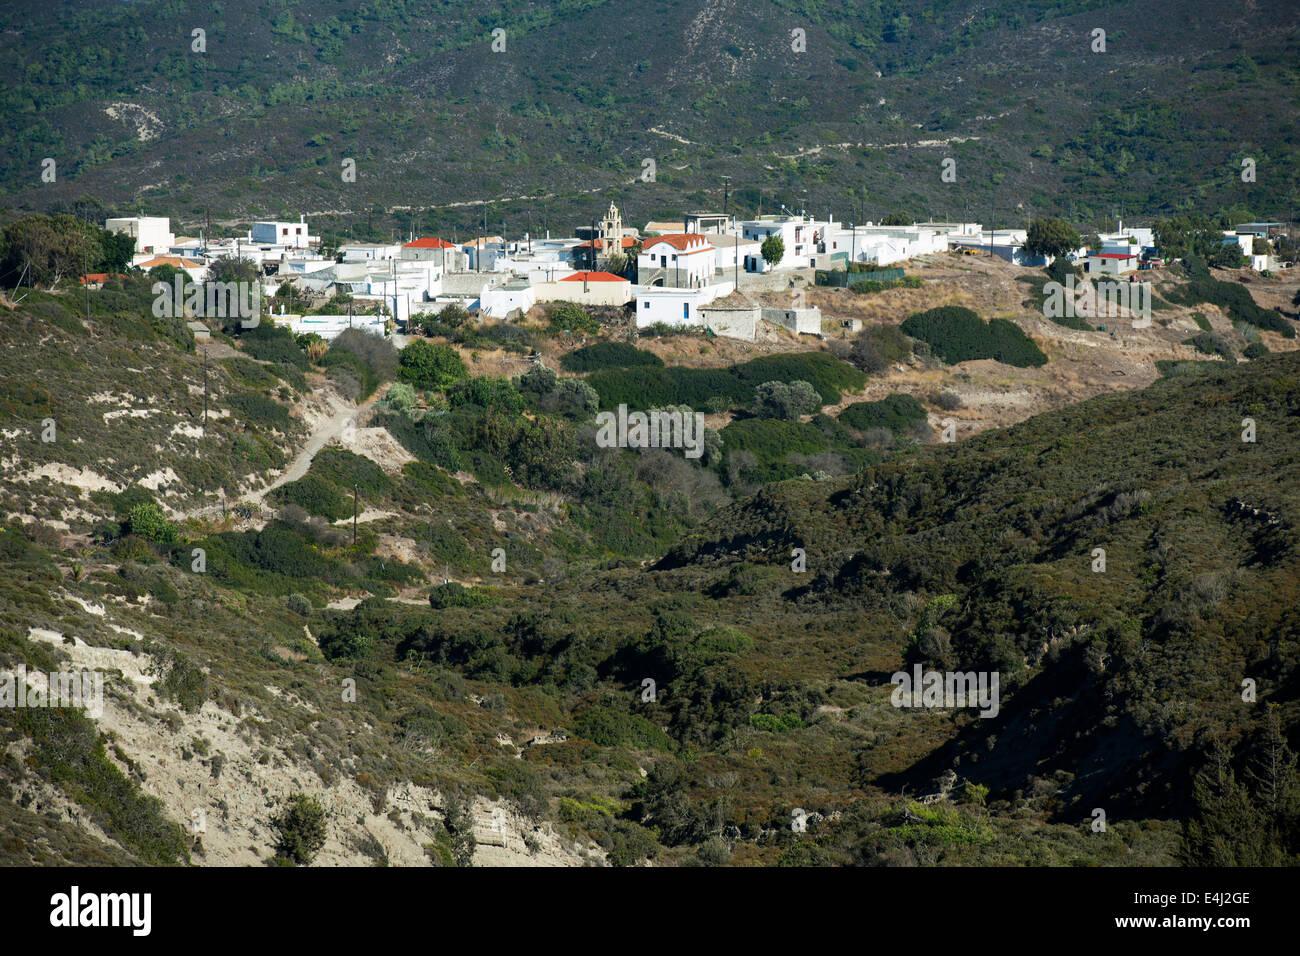 Griechenland, Rhodos, Messanagros (Mesanagros), - Stock Image